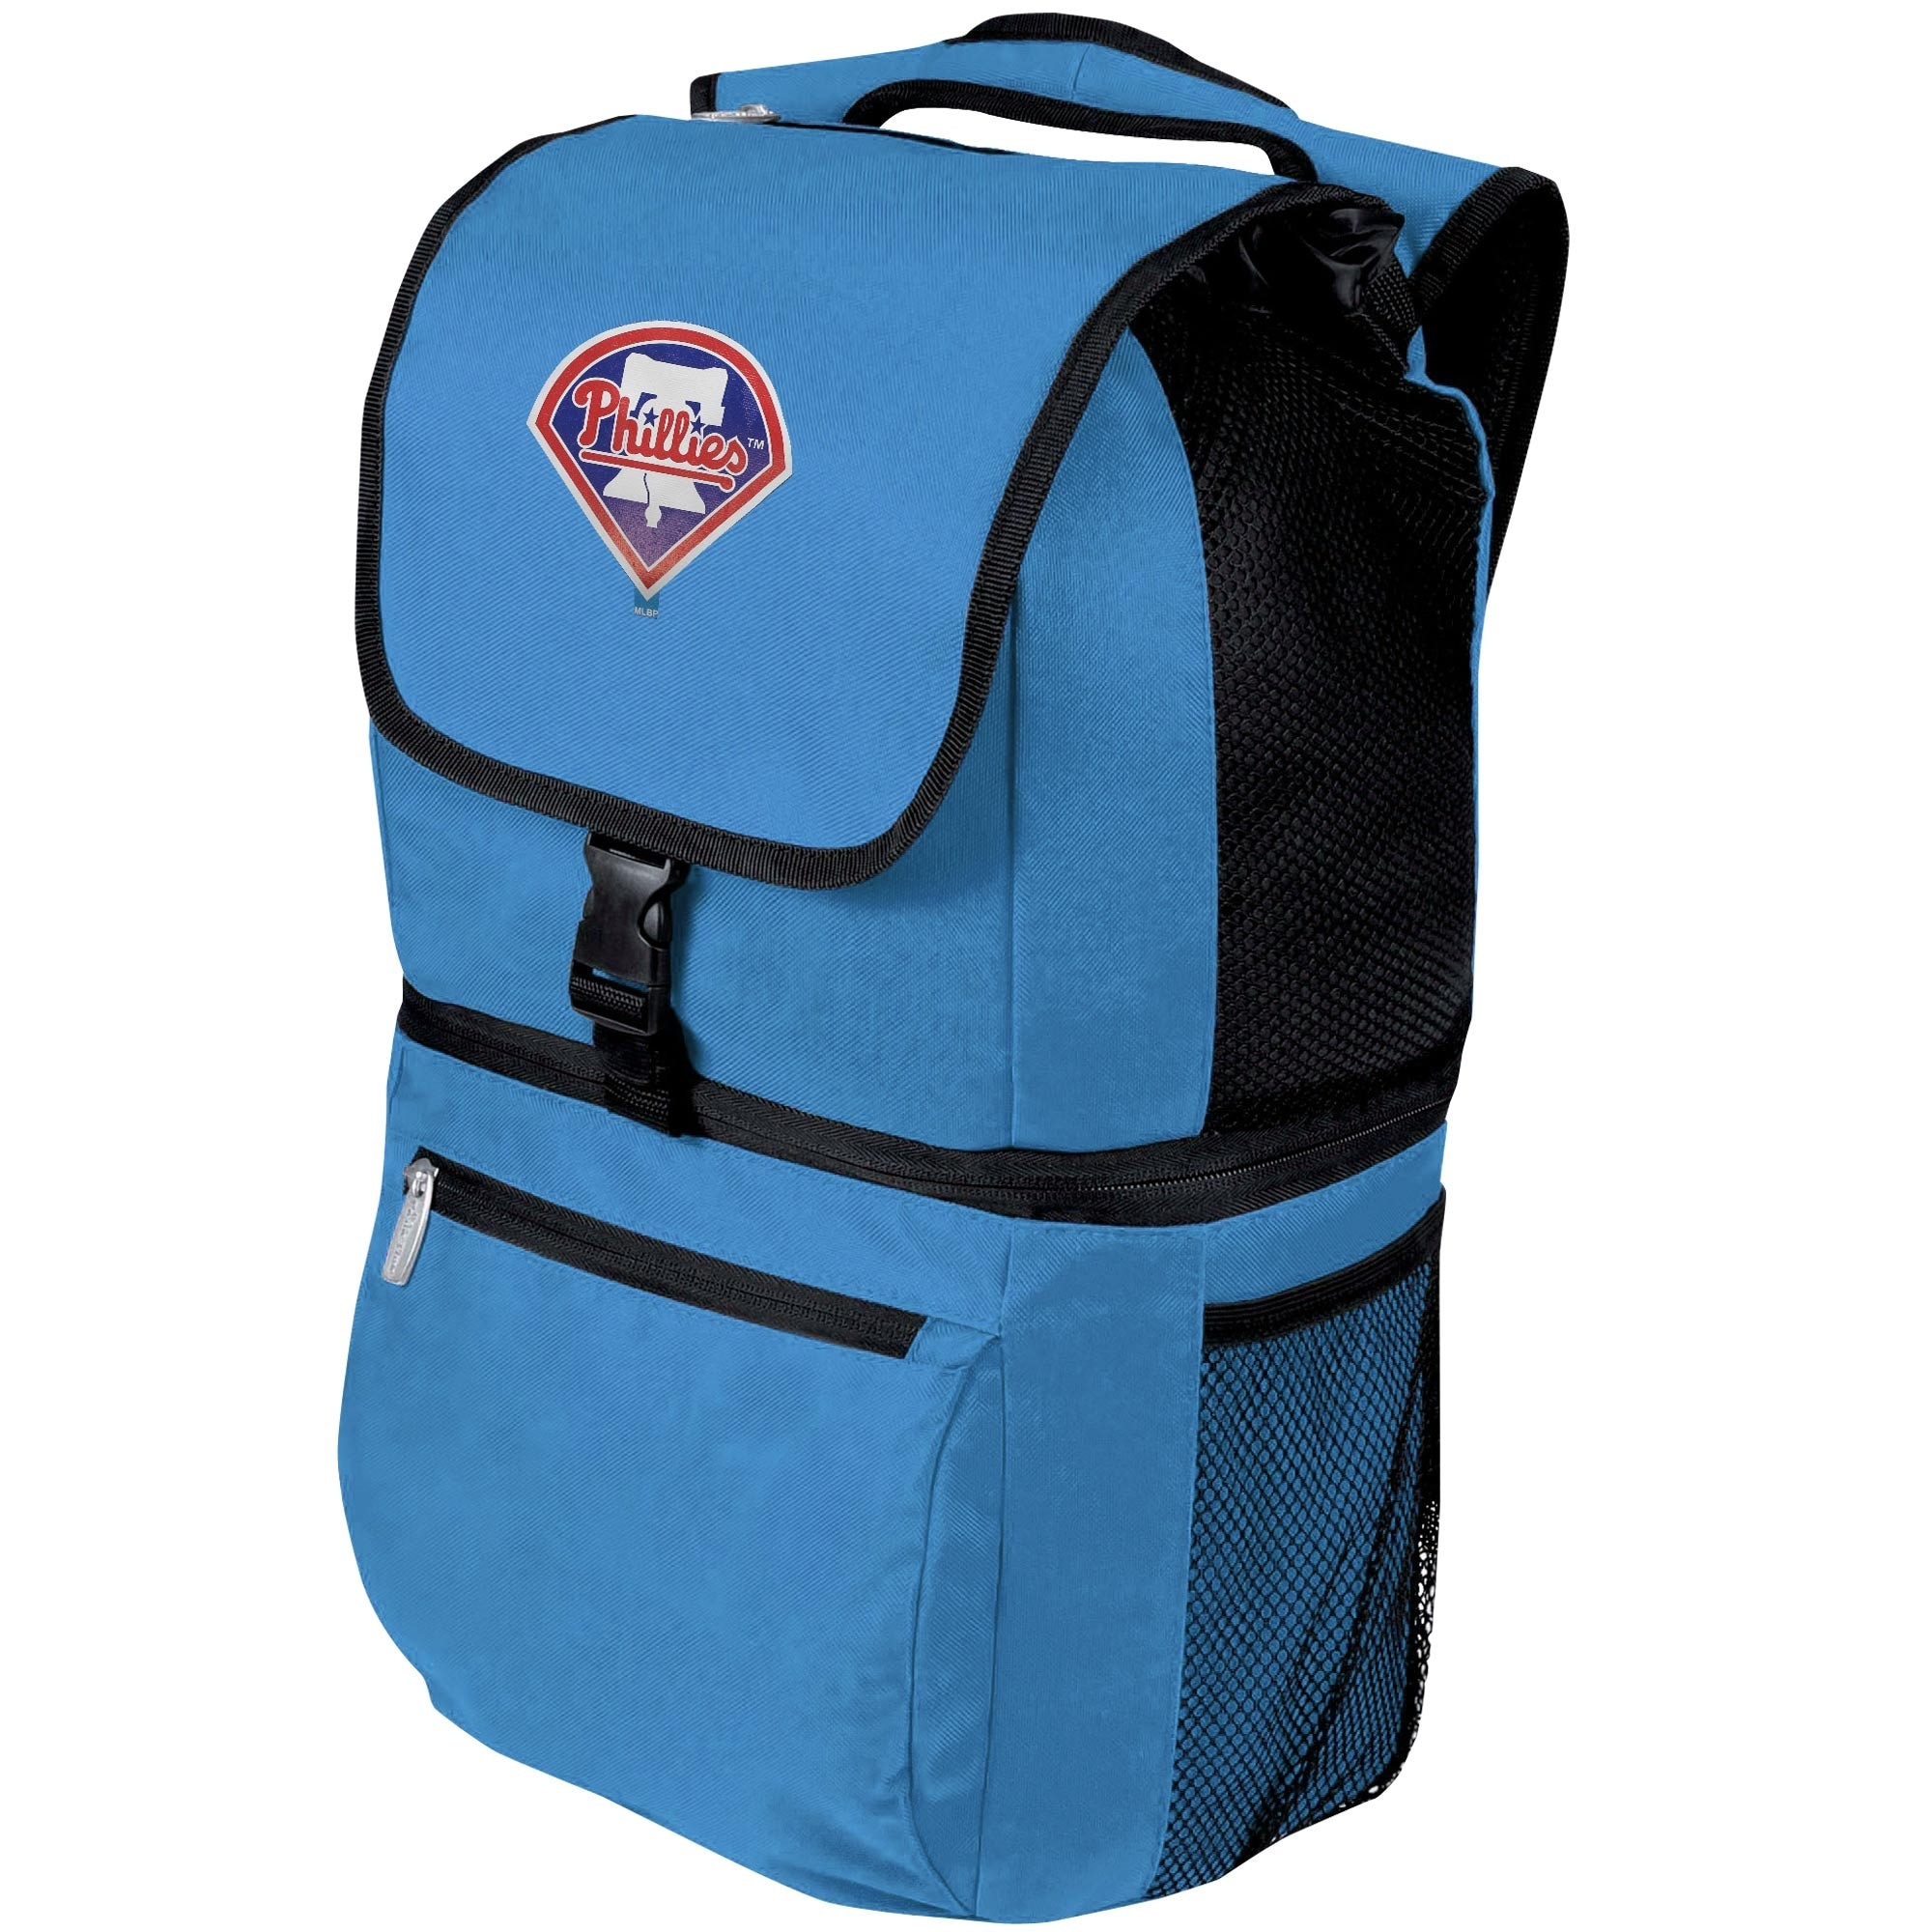 Philadelphia Phillies Zuma Backpack Cooler - Blue